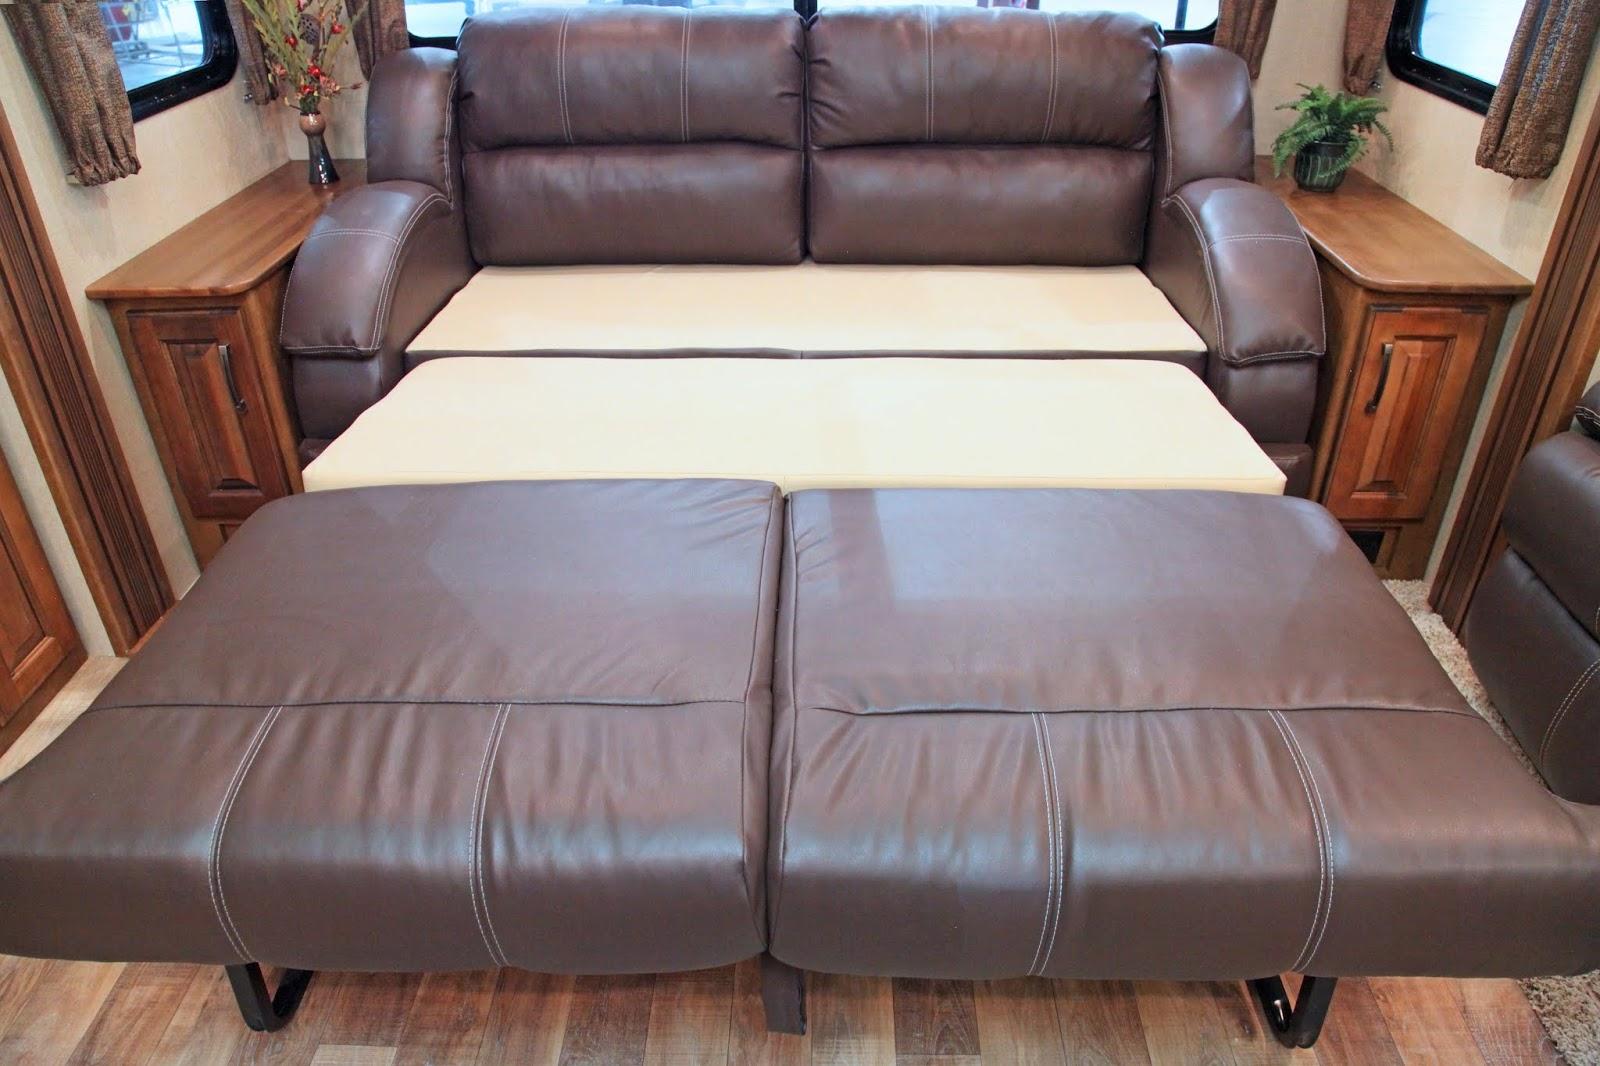 rv tri fold sofa home decor image rh homedecorate review 68 rv tri fold sofa rv tri fold sofa canada